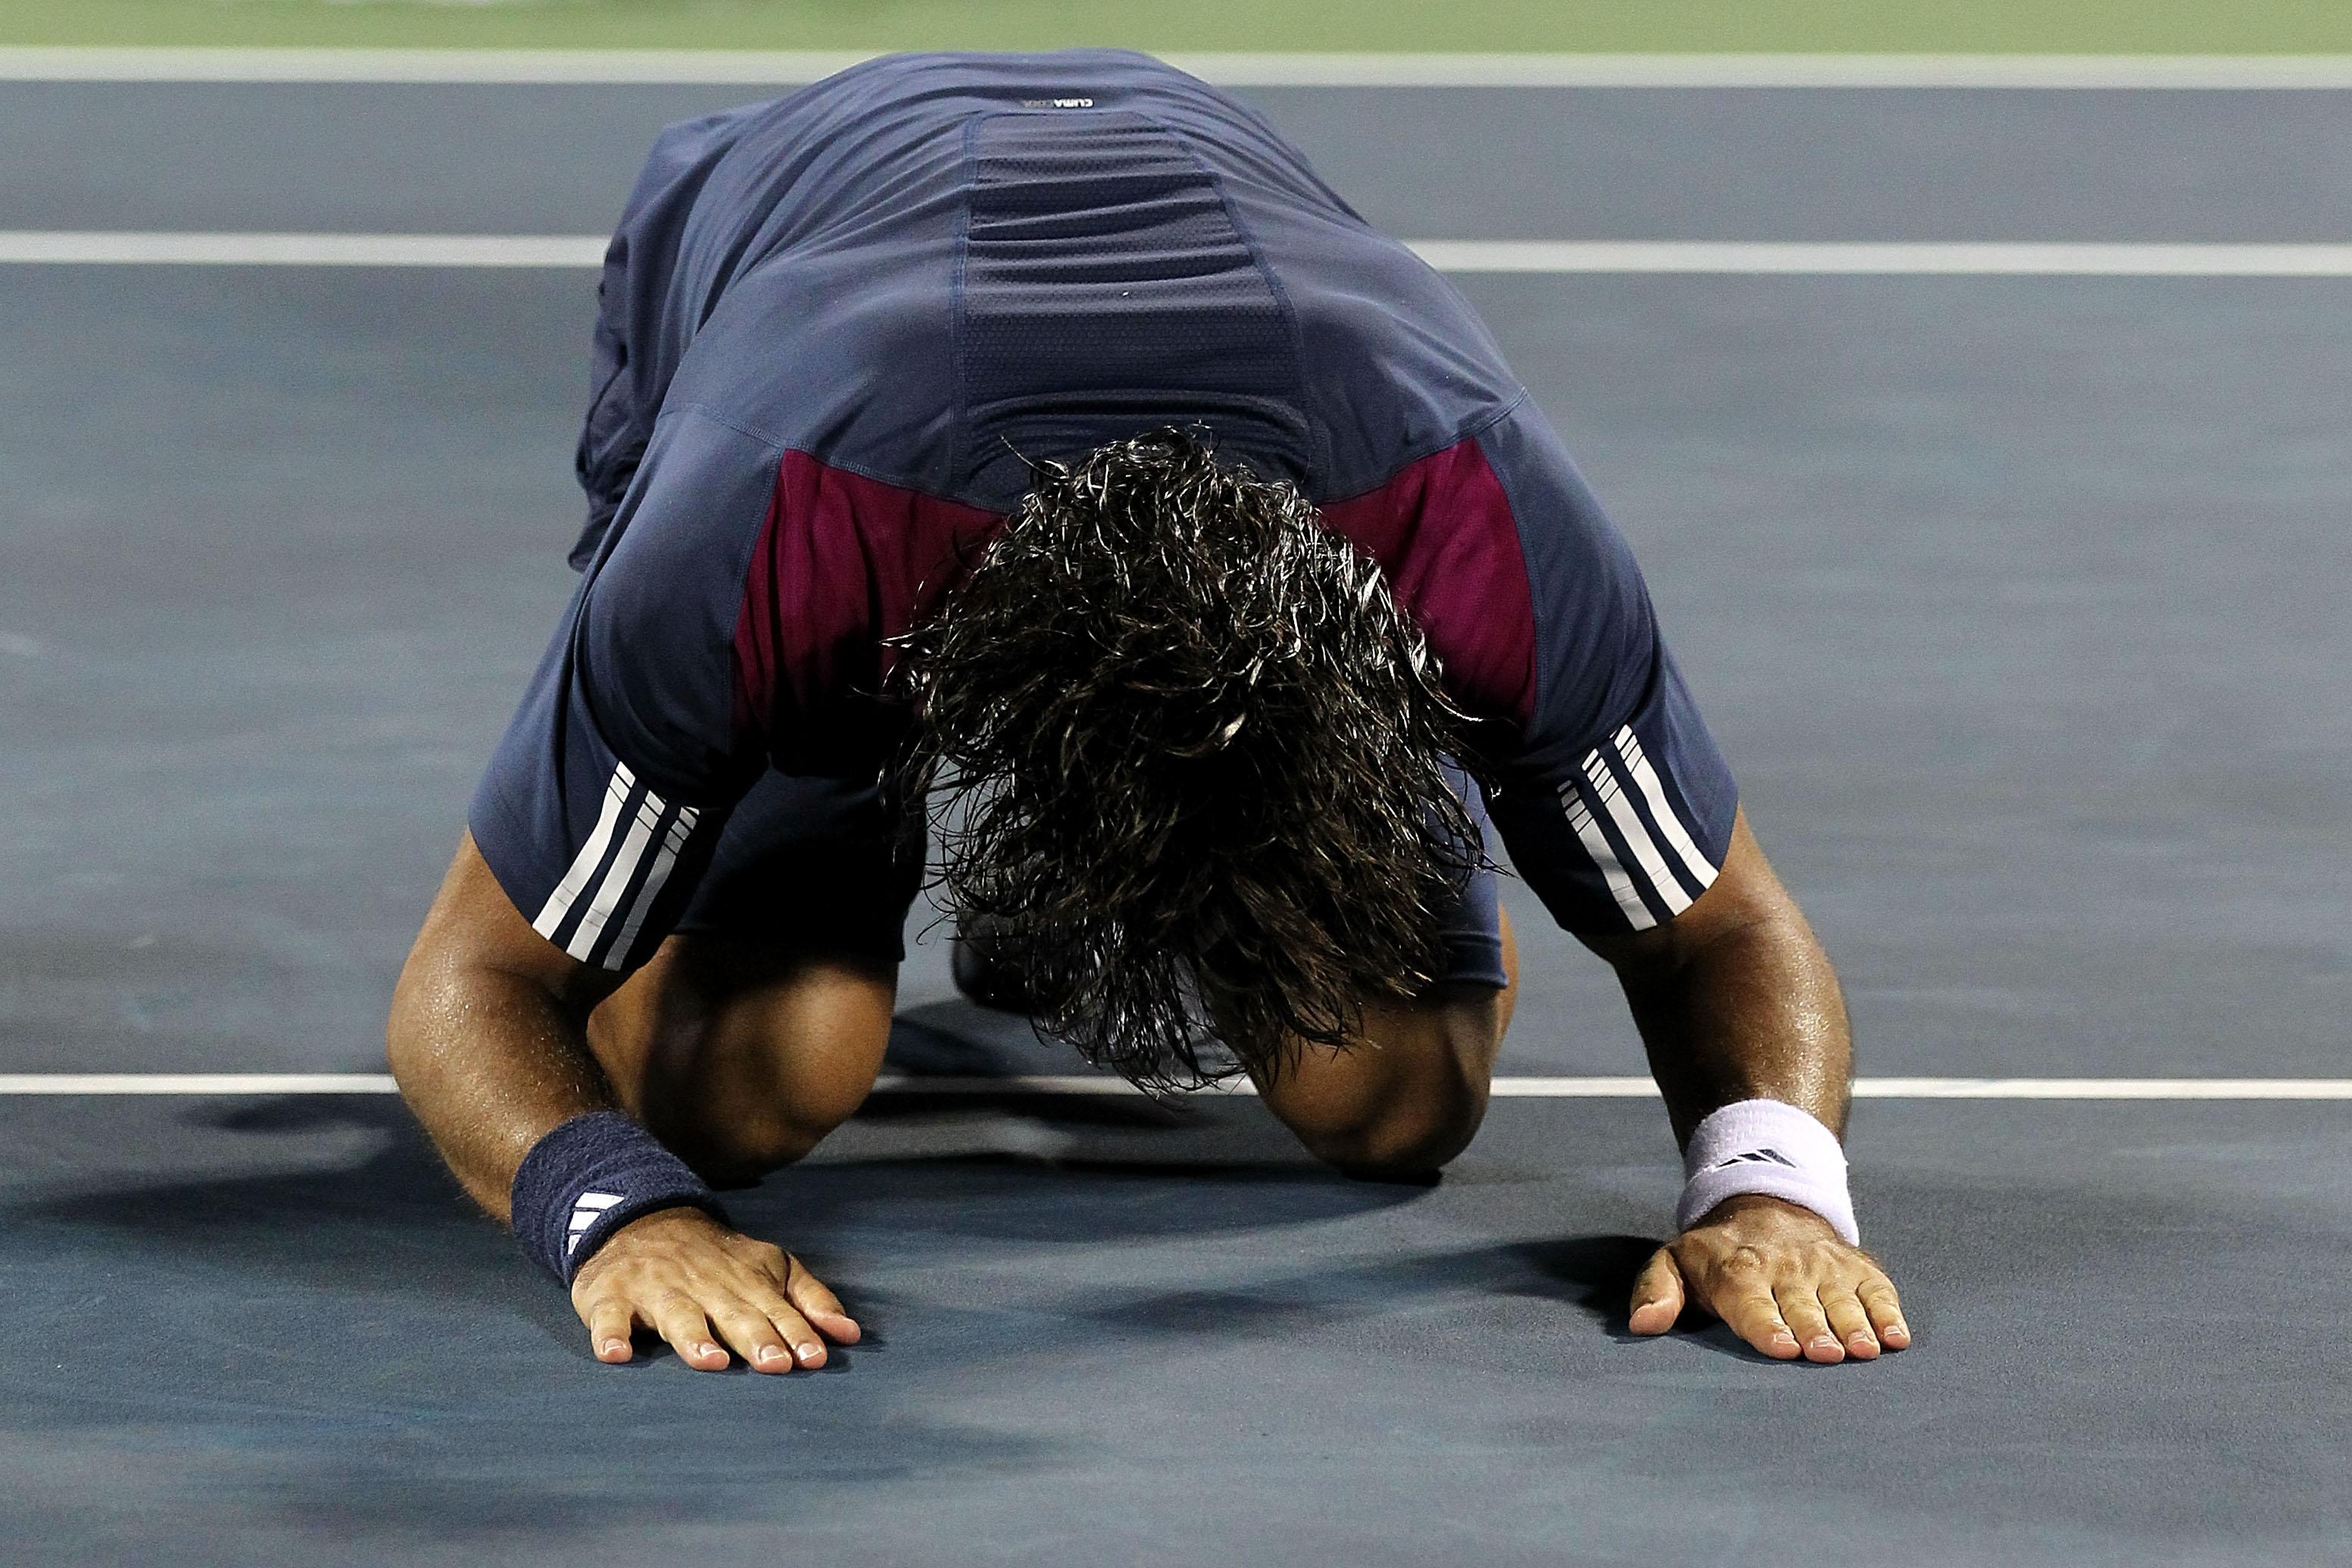 Fernando Verdasco hit the best shot of the year at the US Open against David Ferrer.